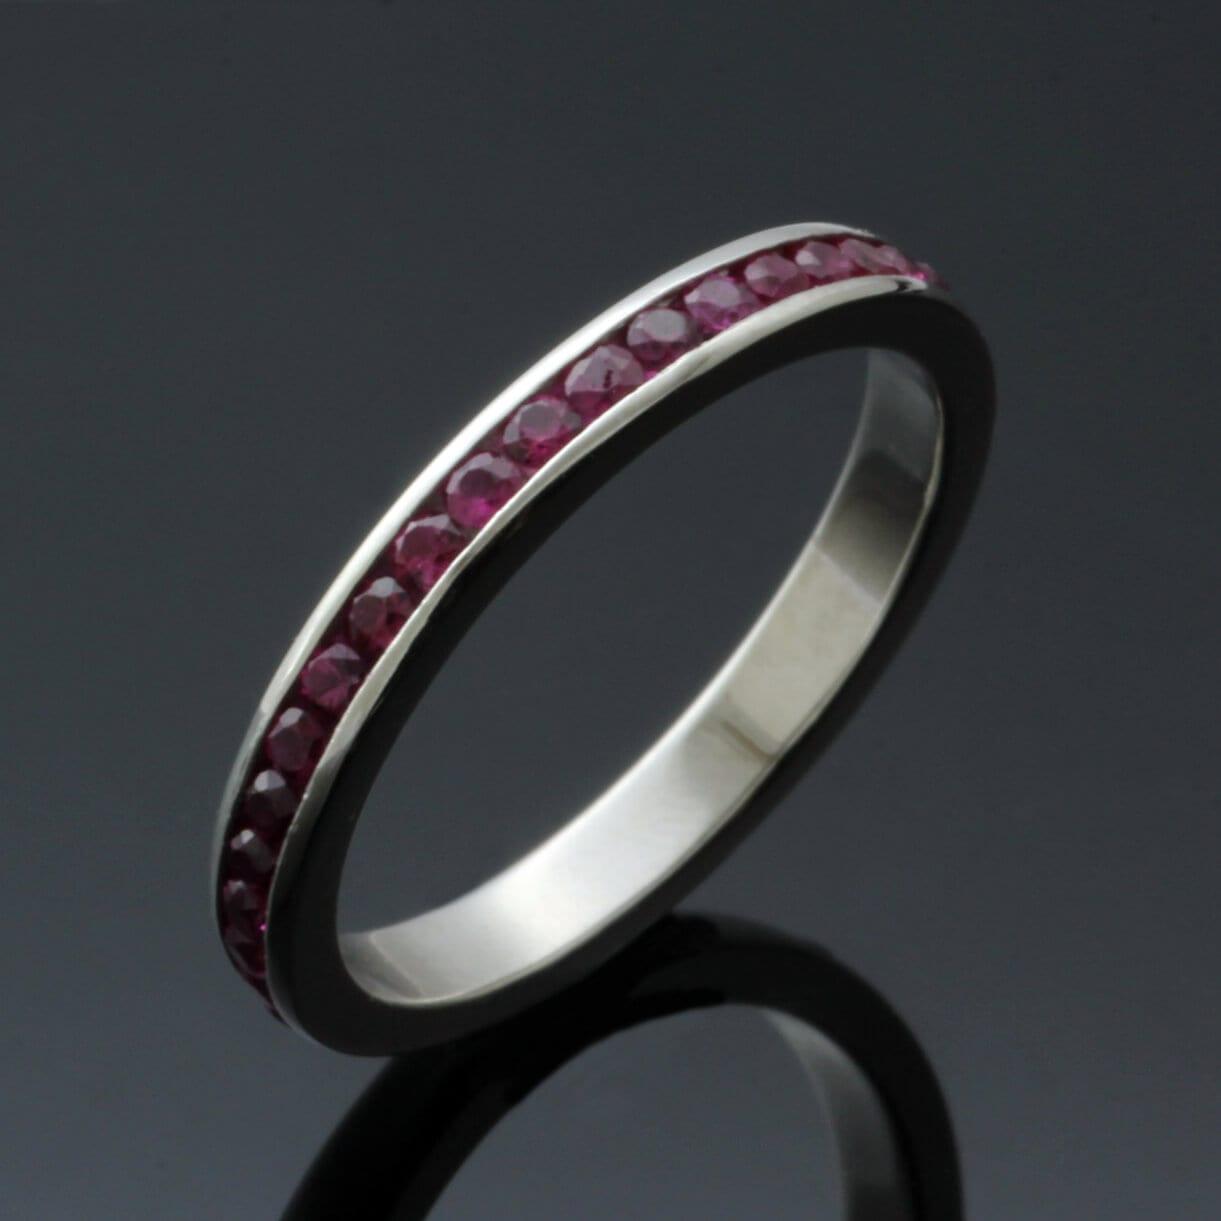 Bespoke Ring Makers